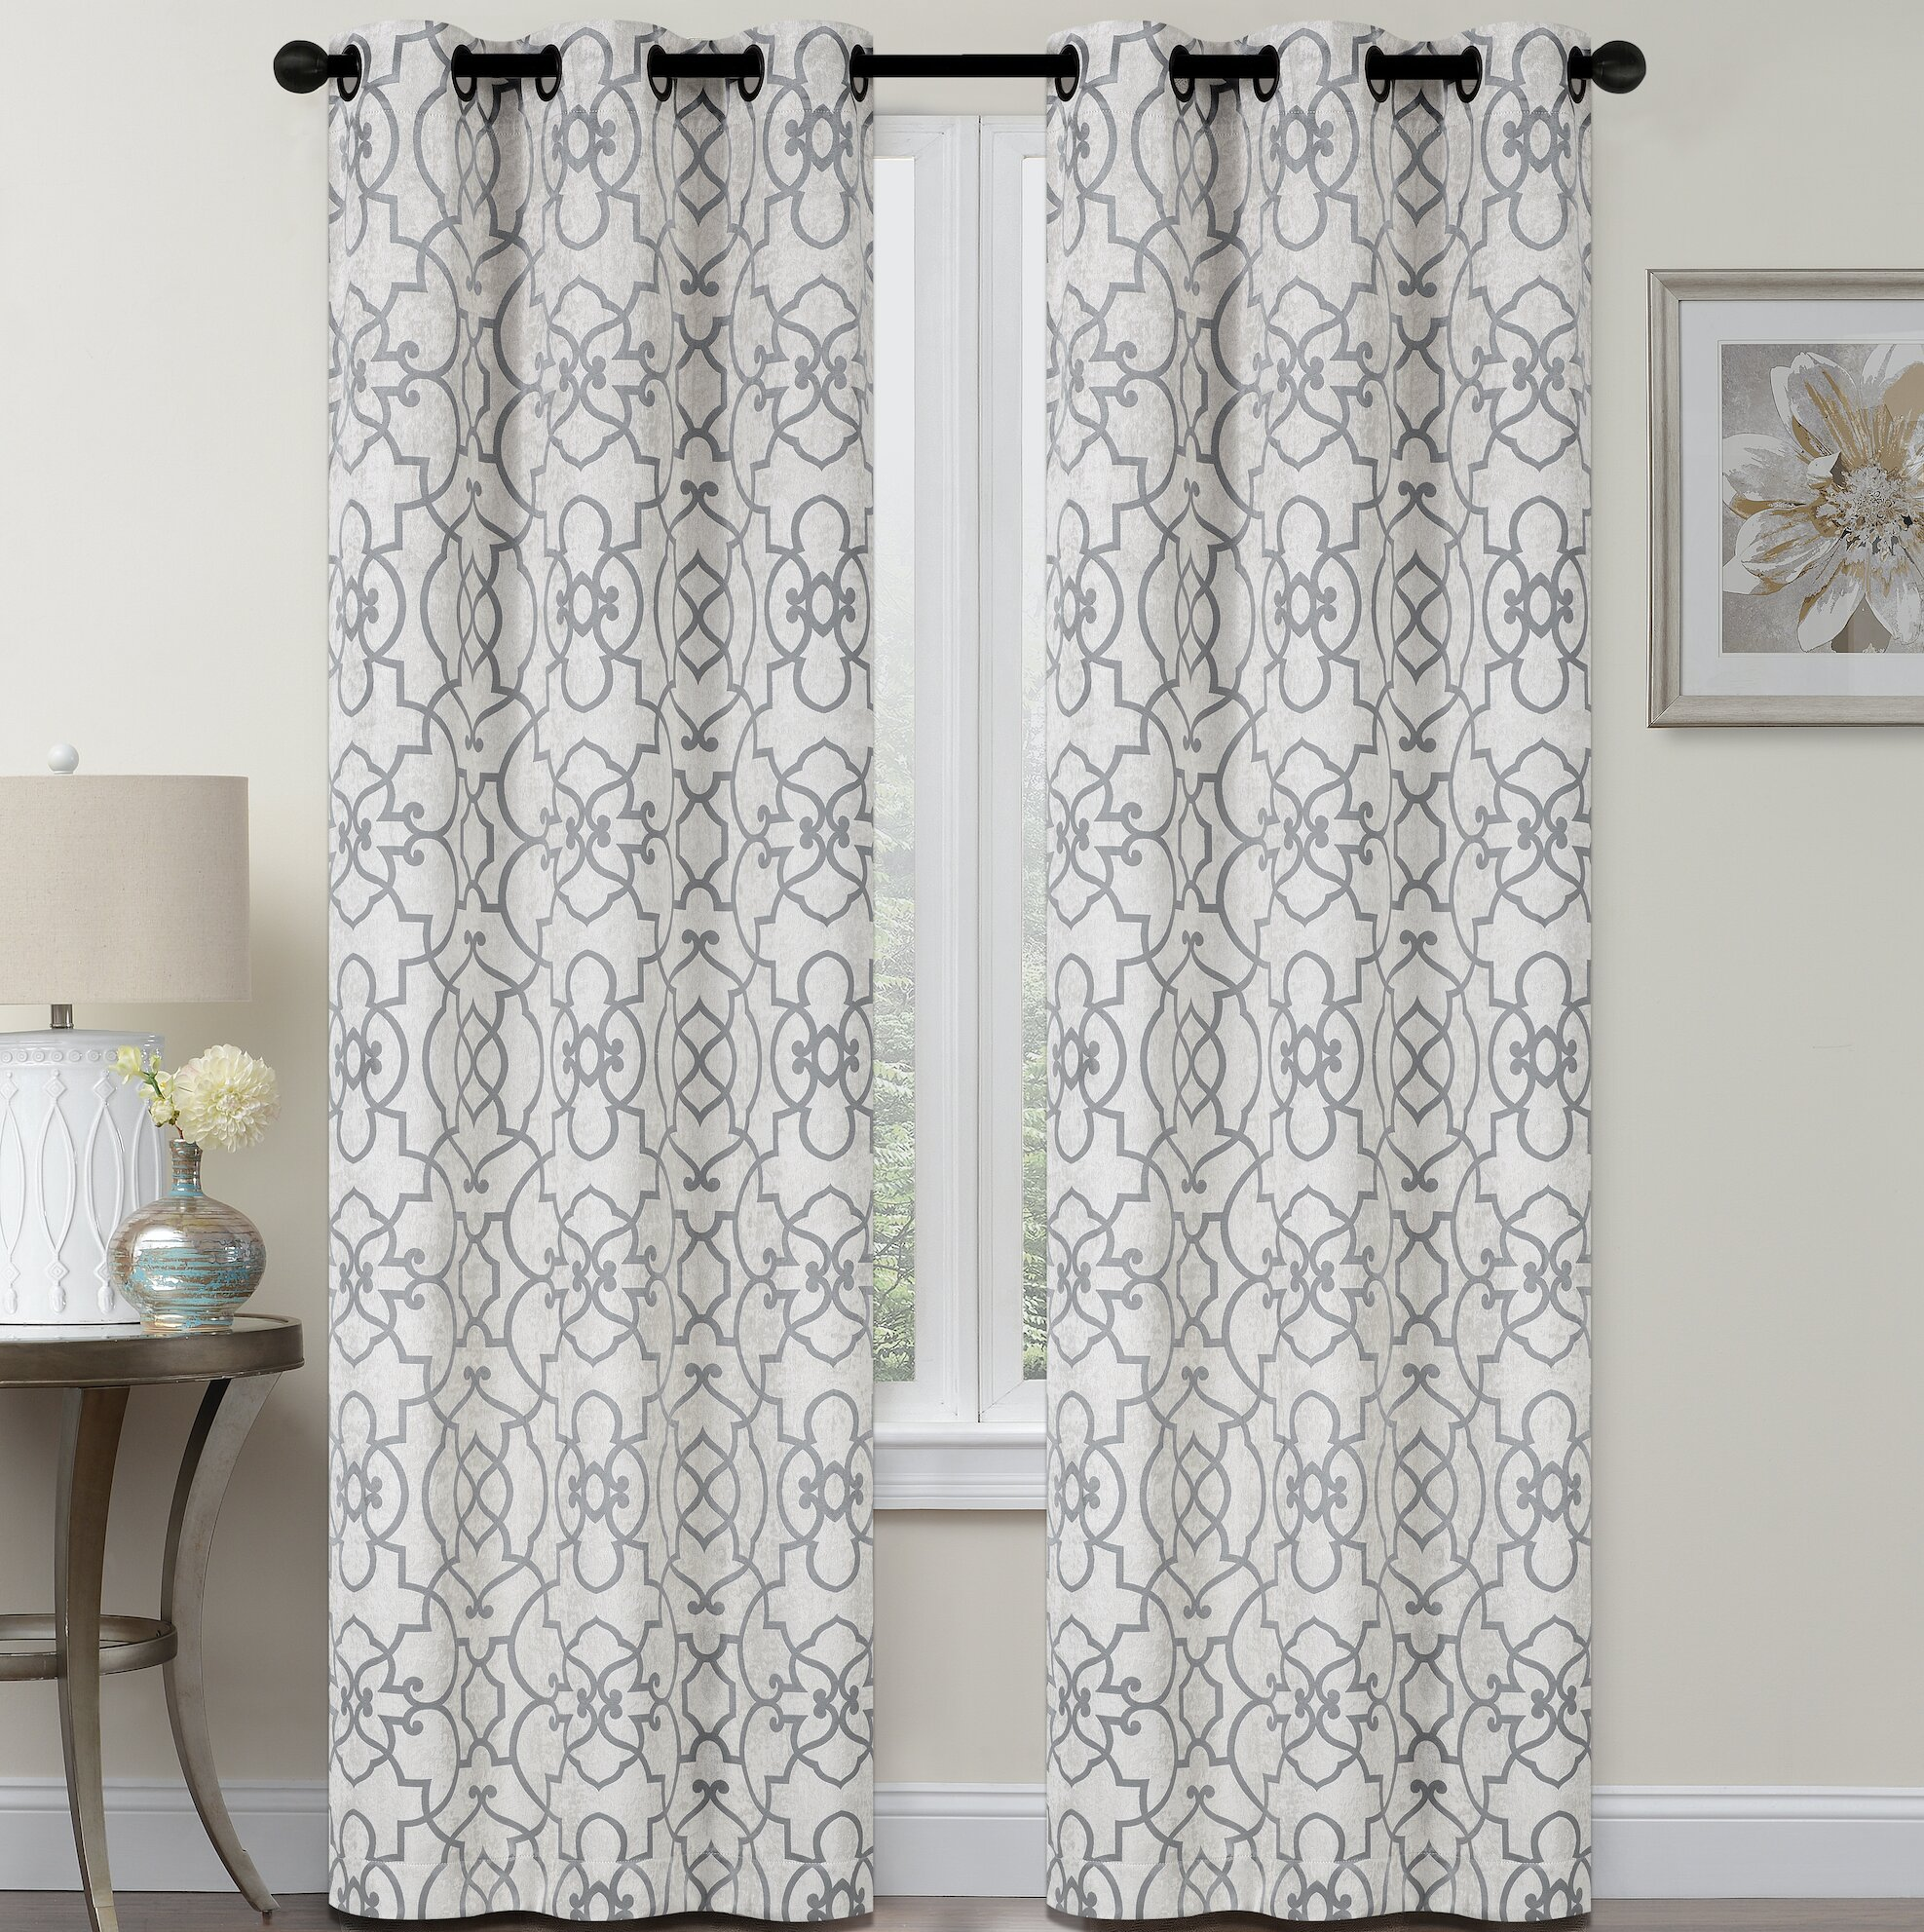 Set 2 Gray Grey White Geometric Trellis Curtains Panels Drapes 84 inch Darkening